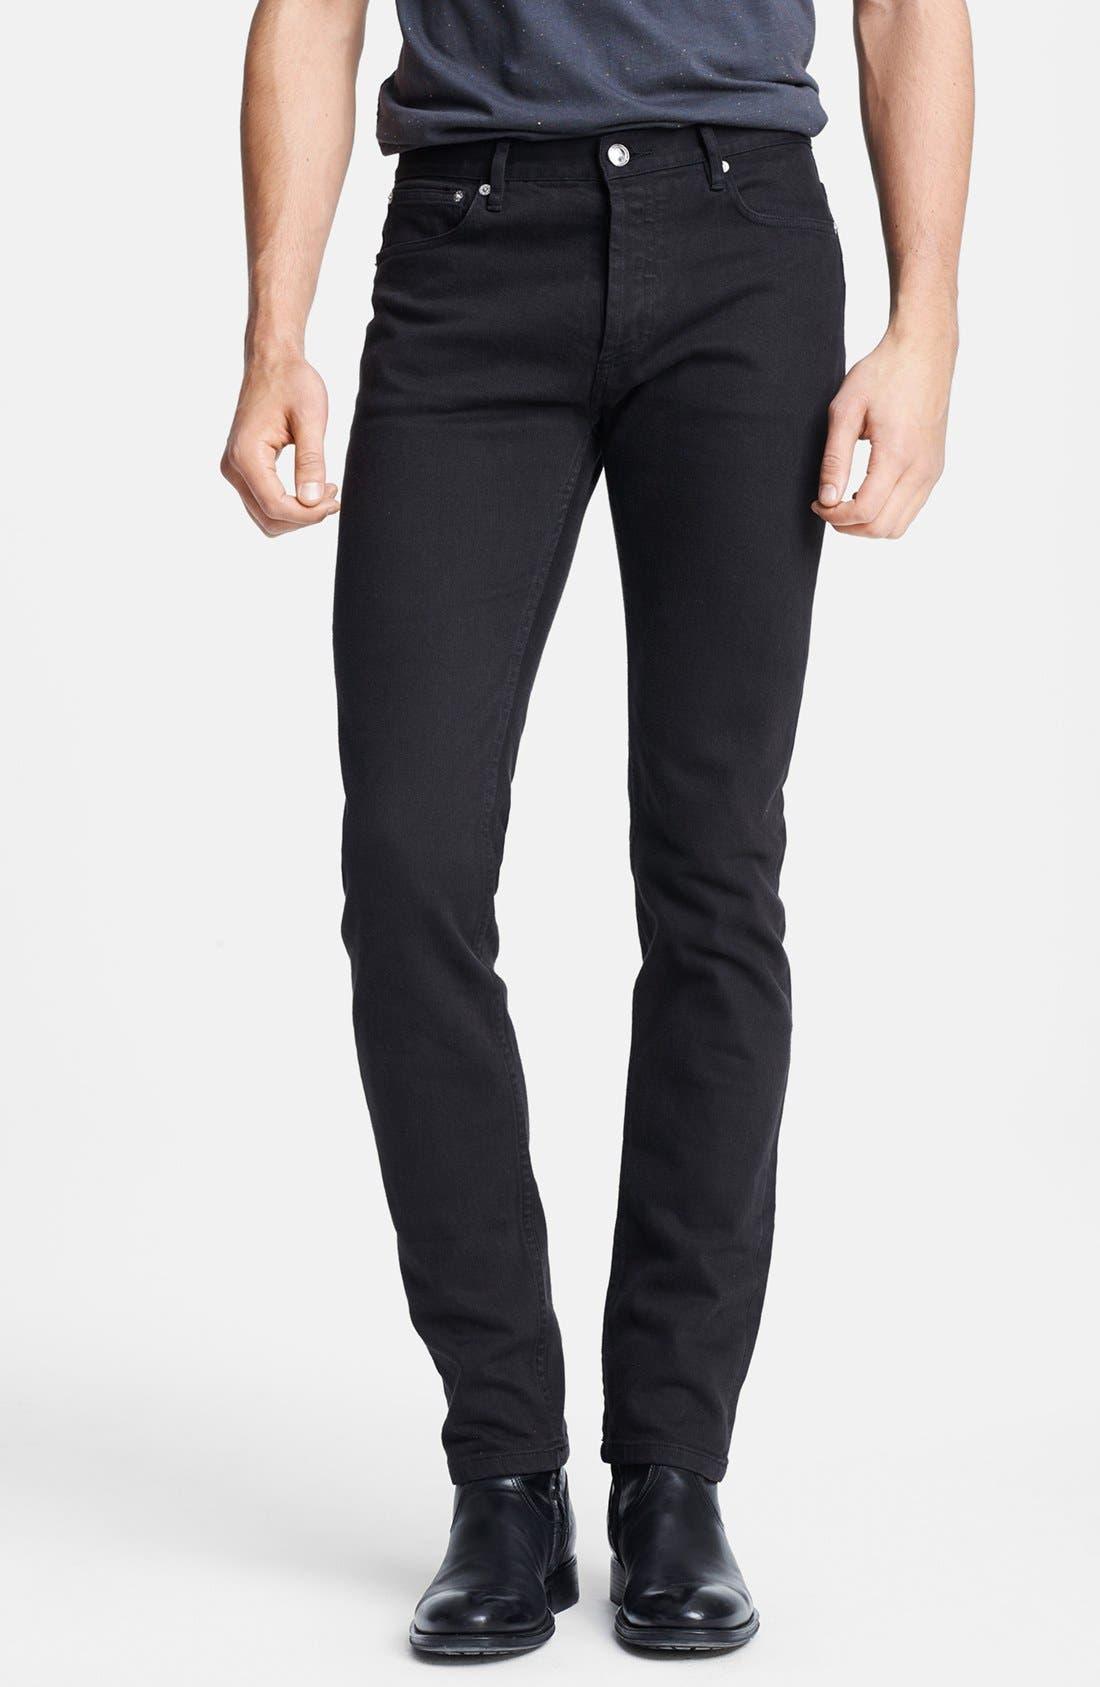 Main Image - A.P.C. 'Petit Standard' Skinny Fit Jeans (Black)